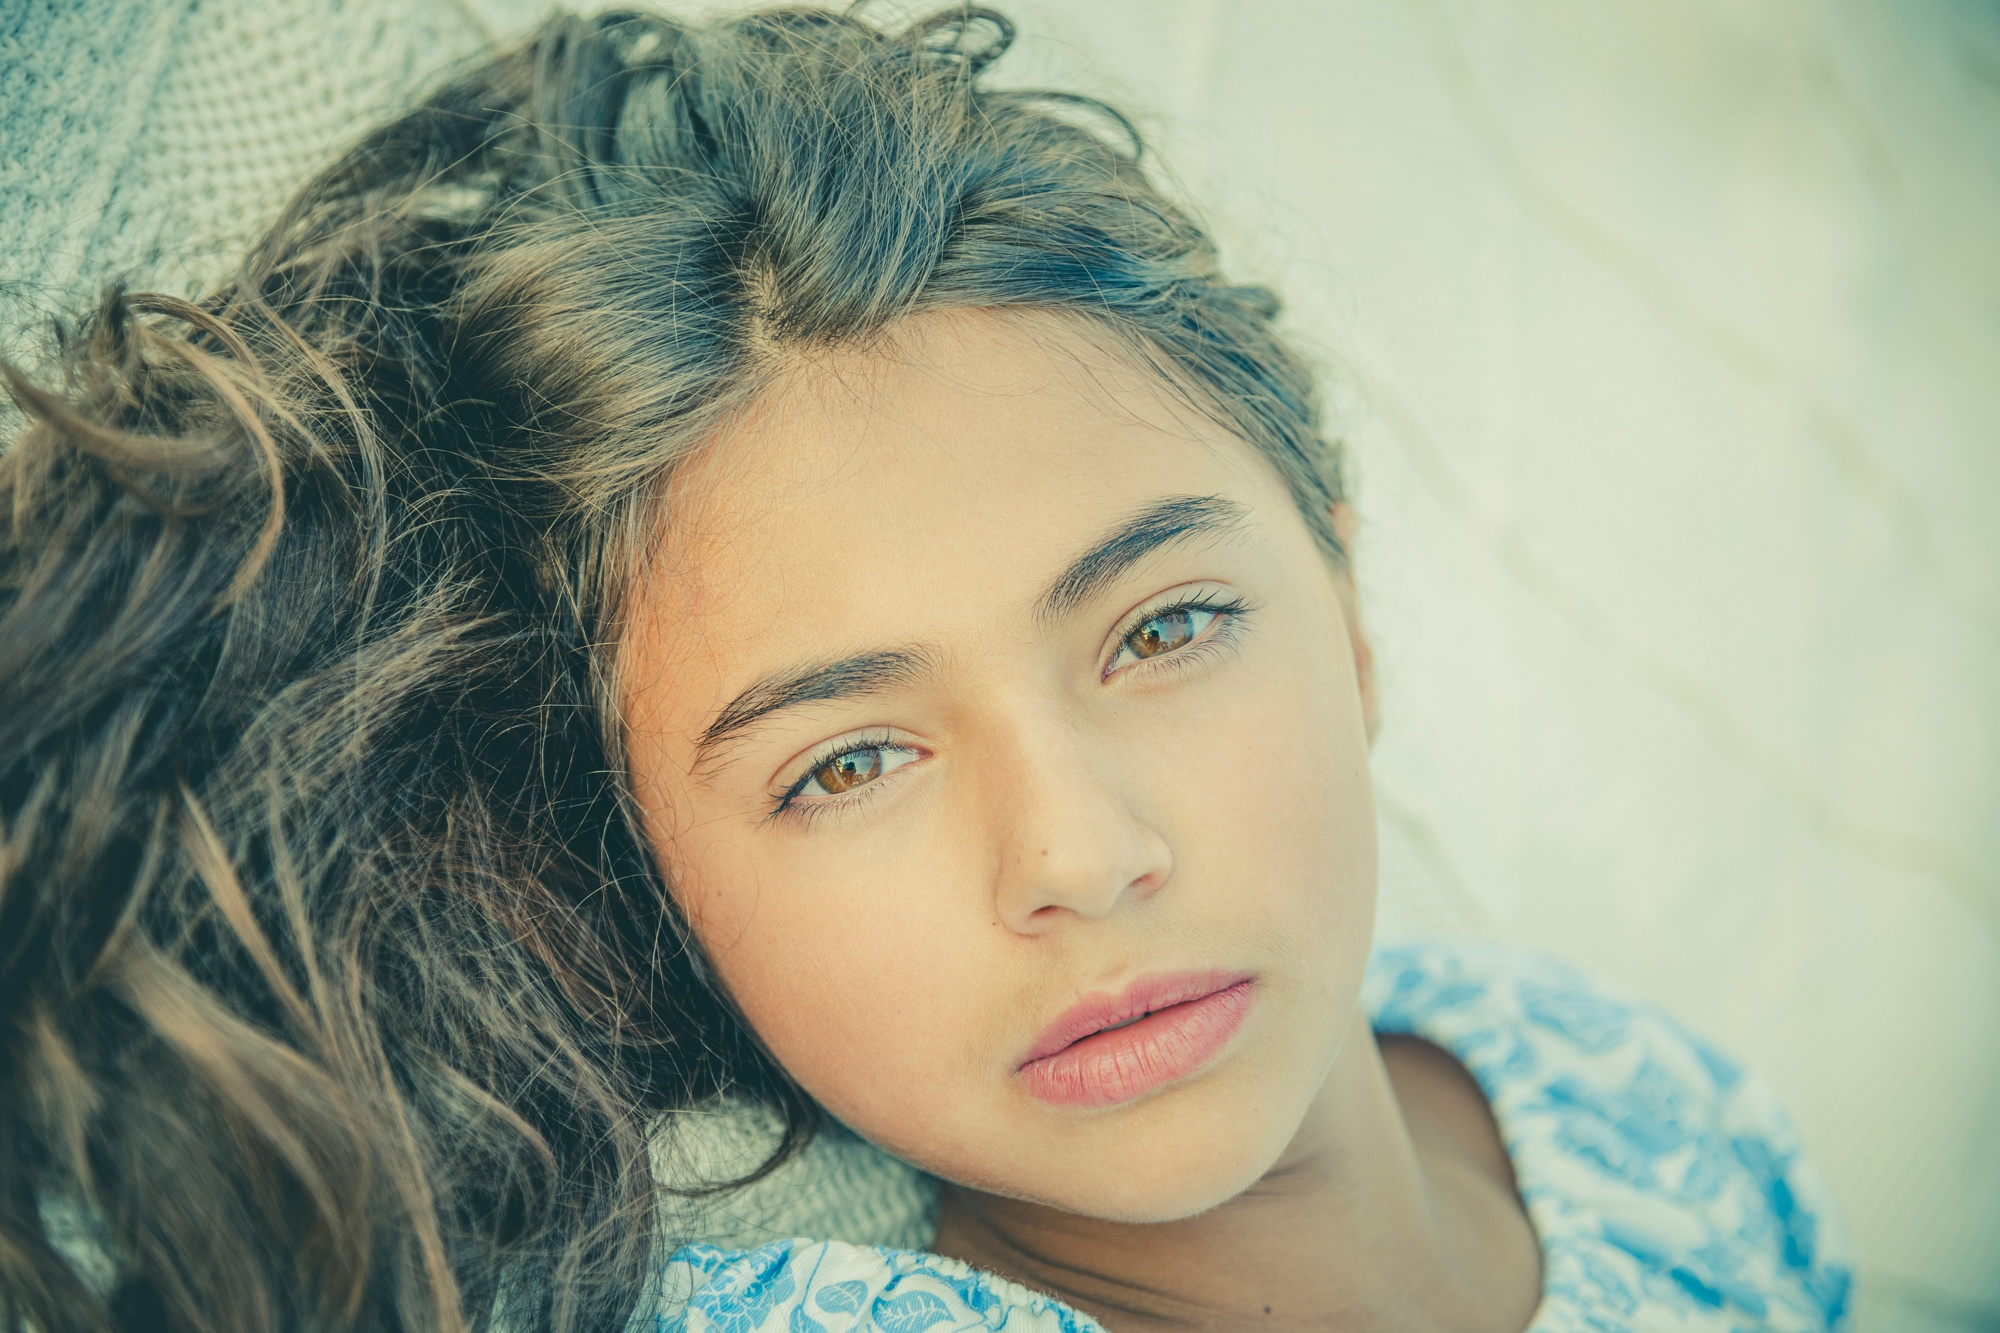 Adolescentes - Inicio - Julian Garcia Fotógrafo, Fotografia